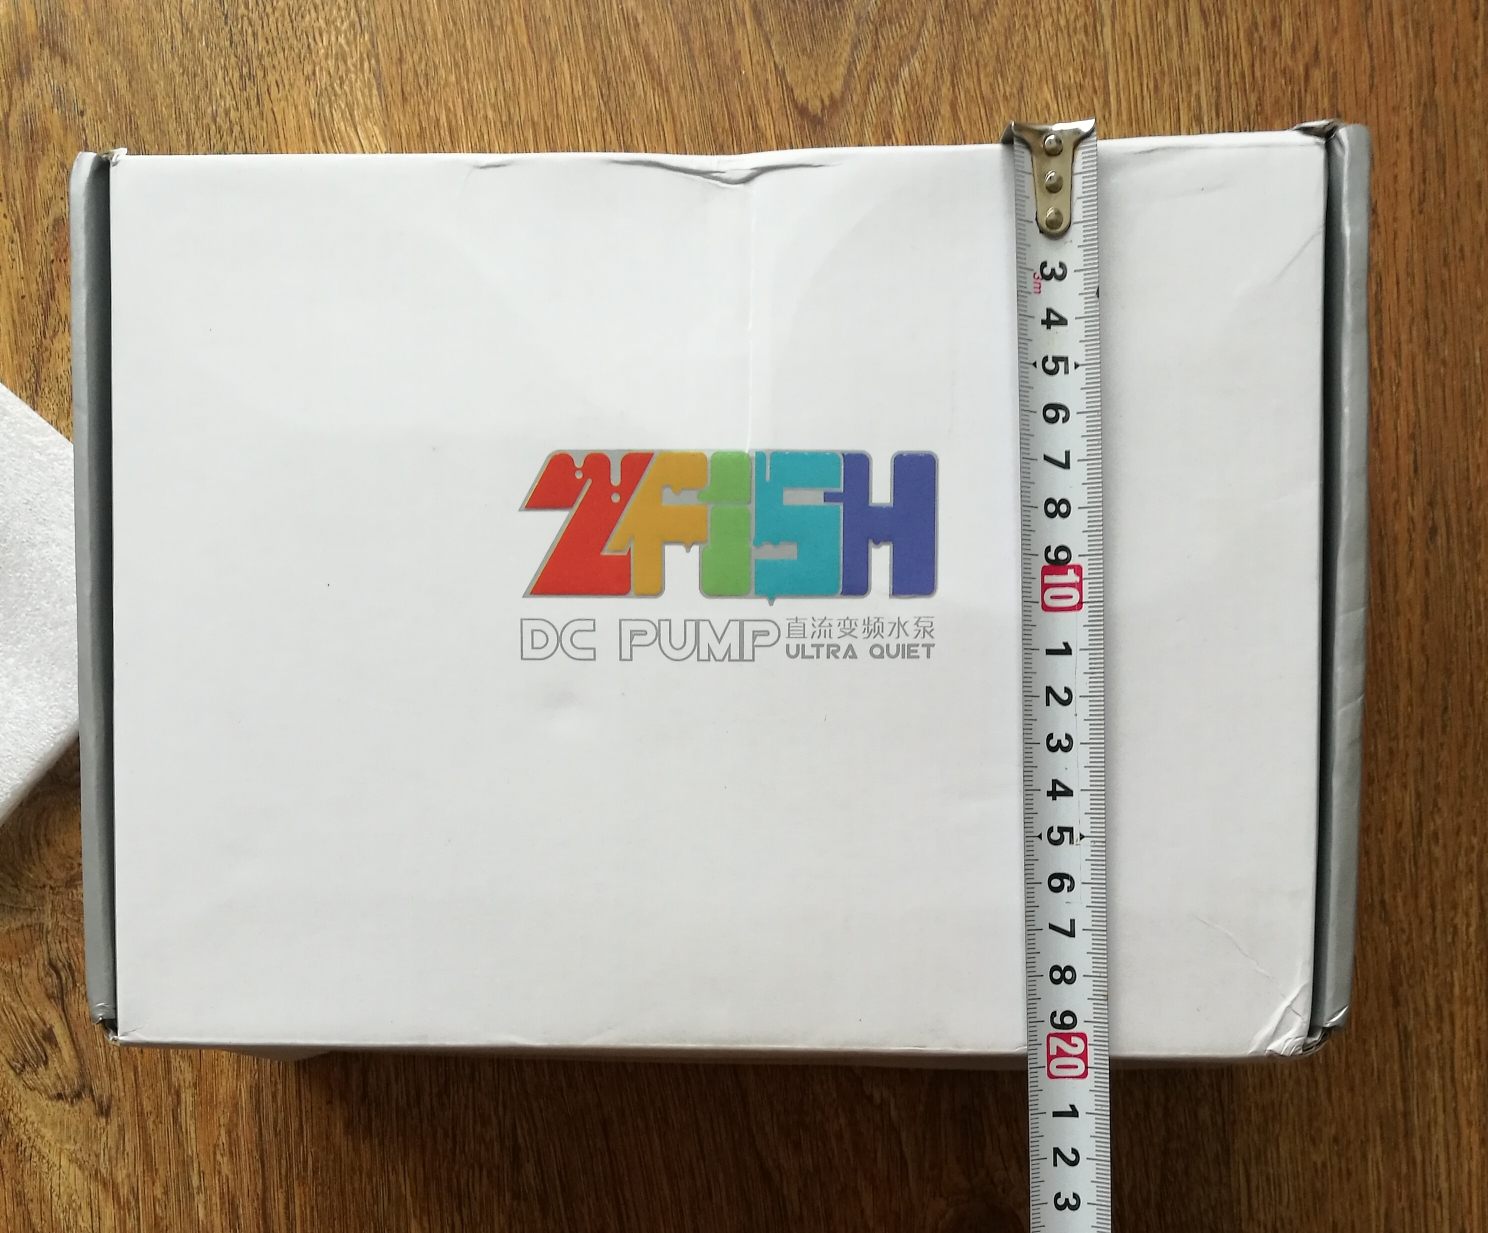 ZFISH变频水泵试用报告 北京龙鱼论坛 北京龙鱼第30张